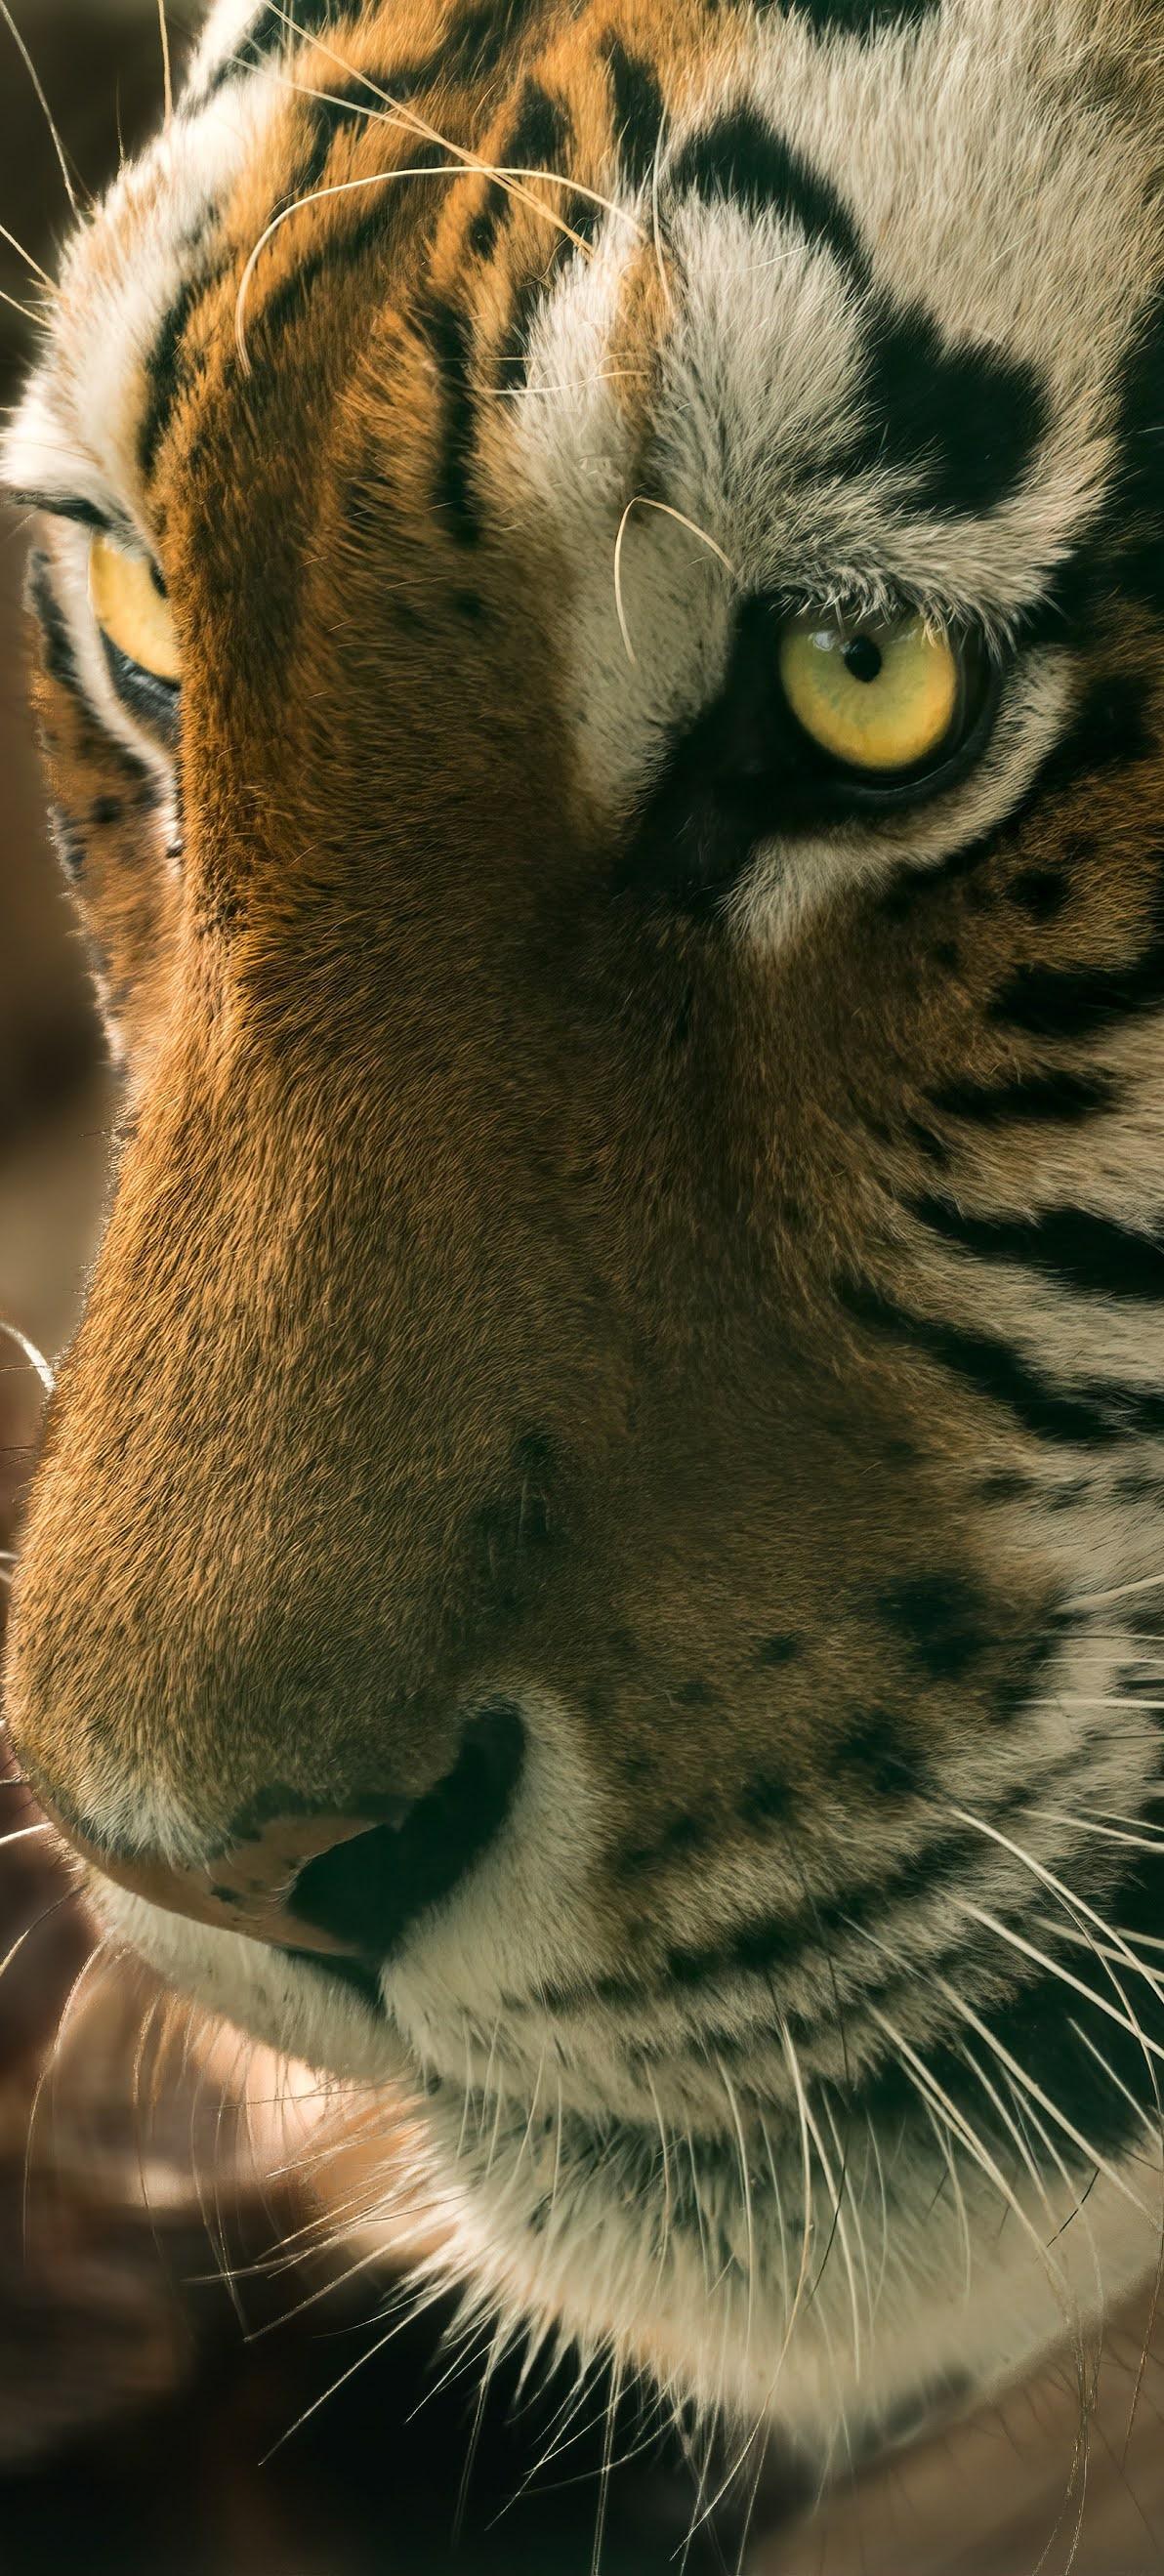 Amazing tiger face capture.